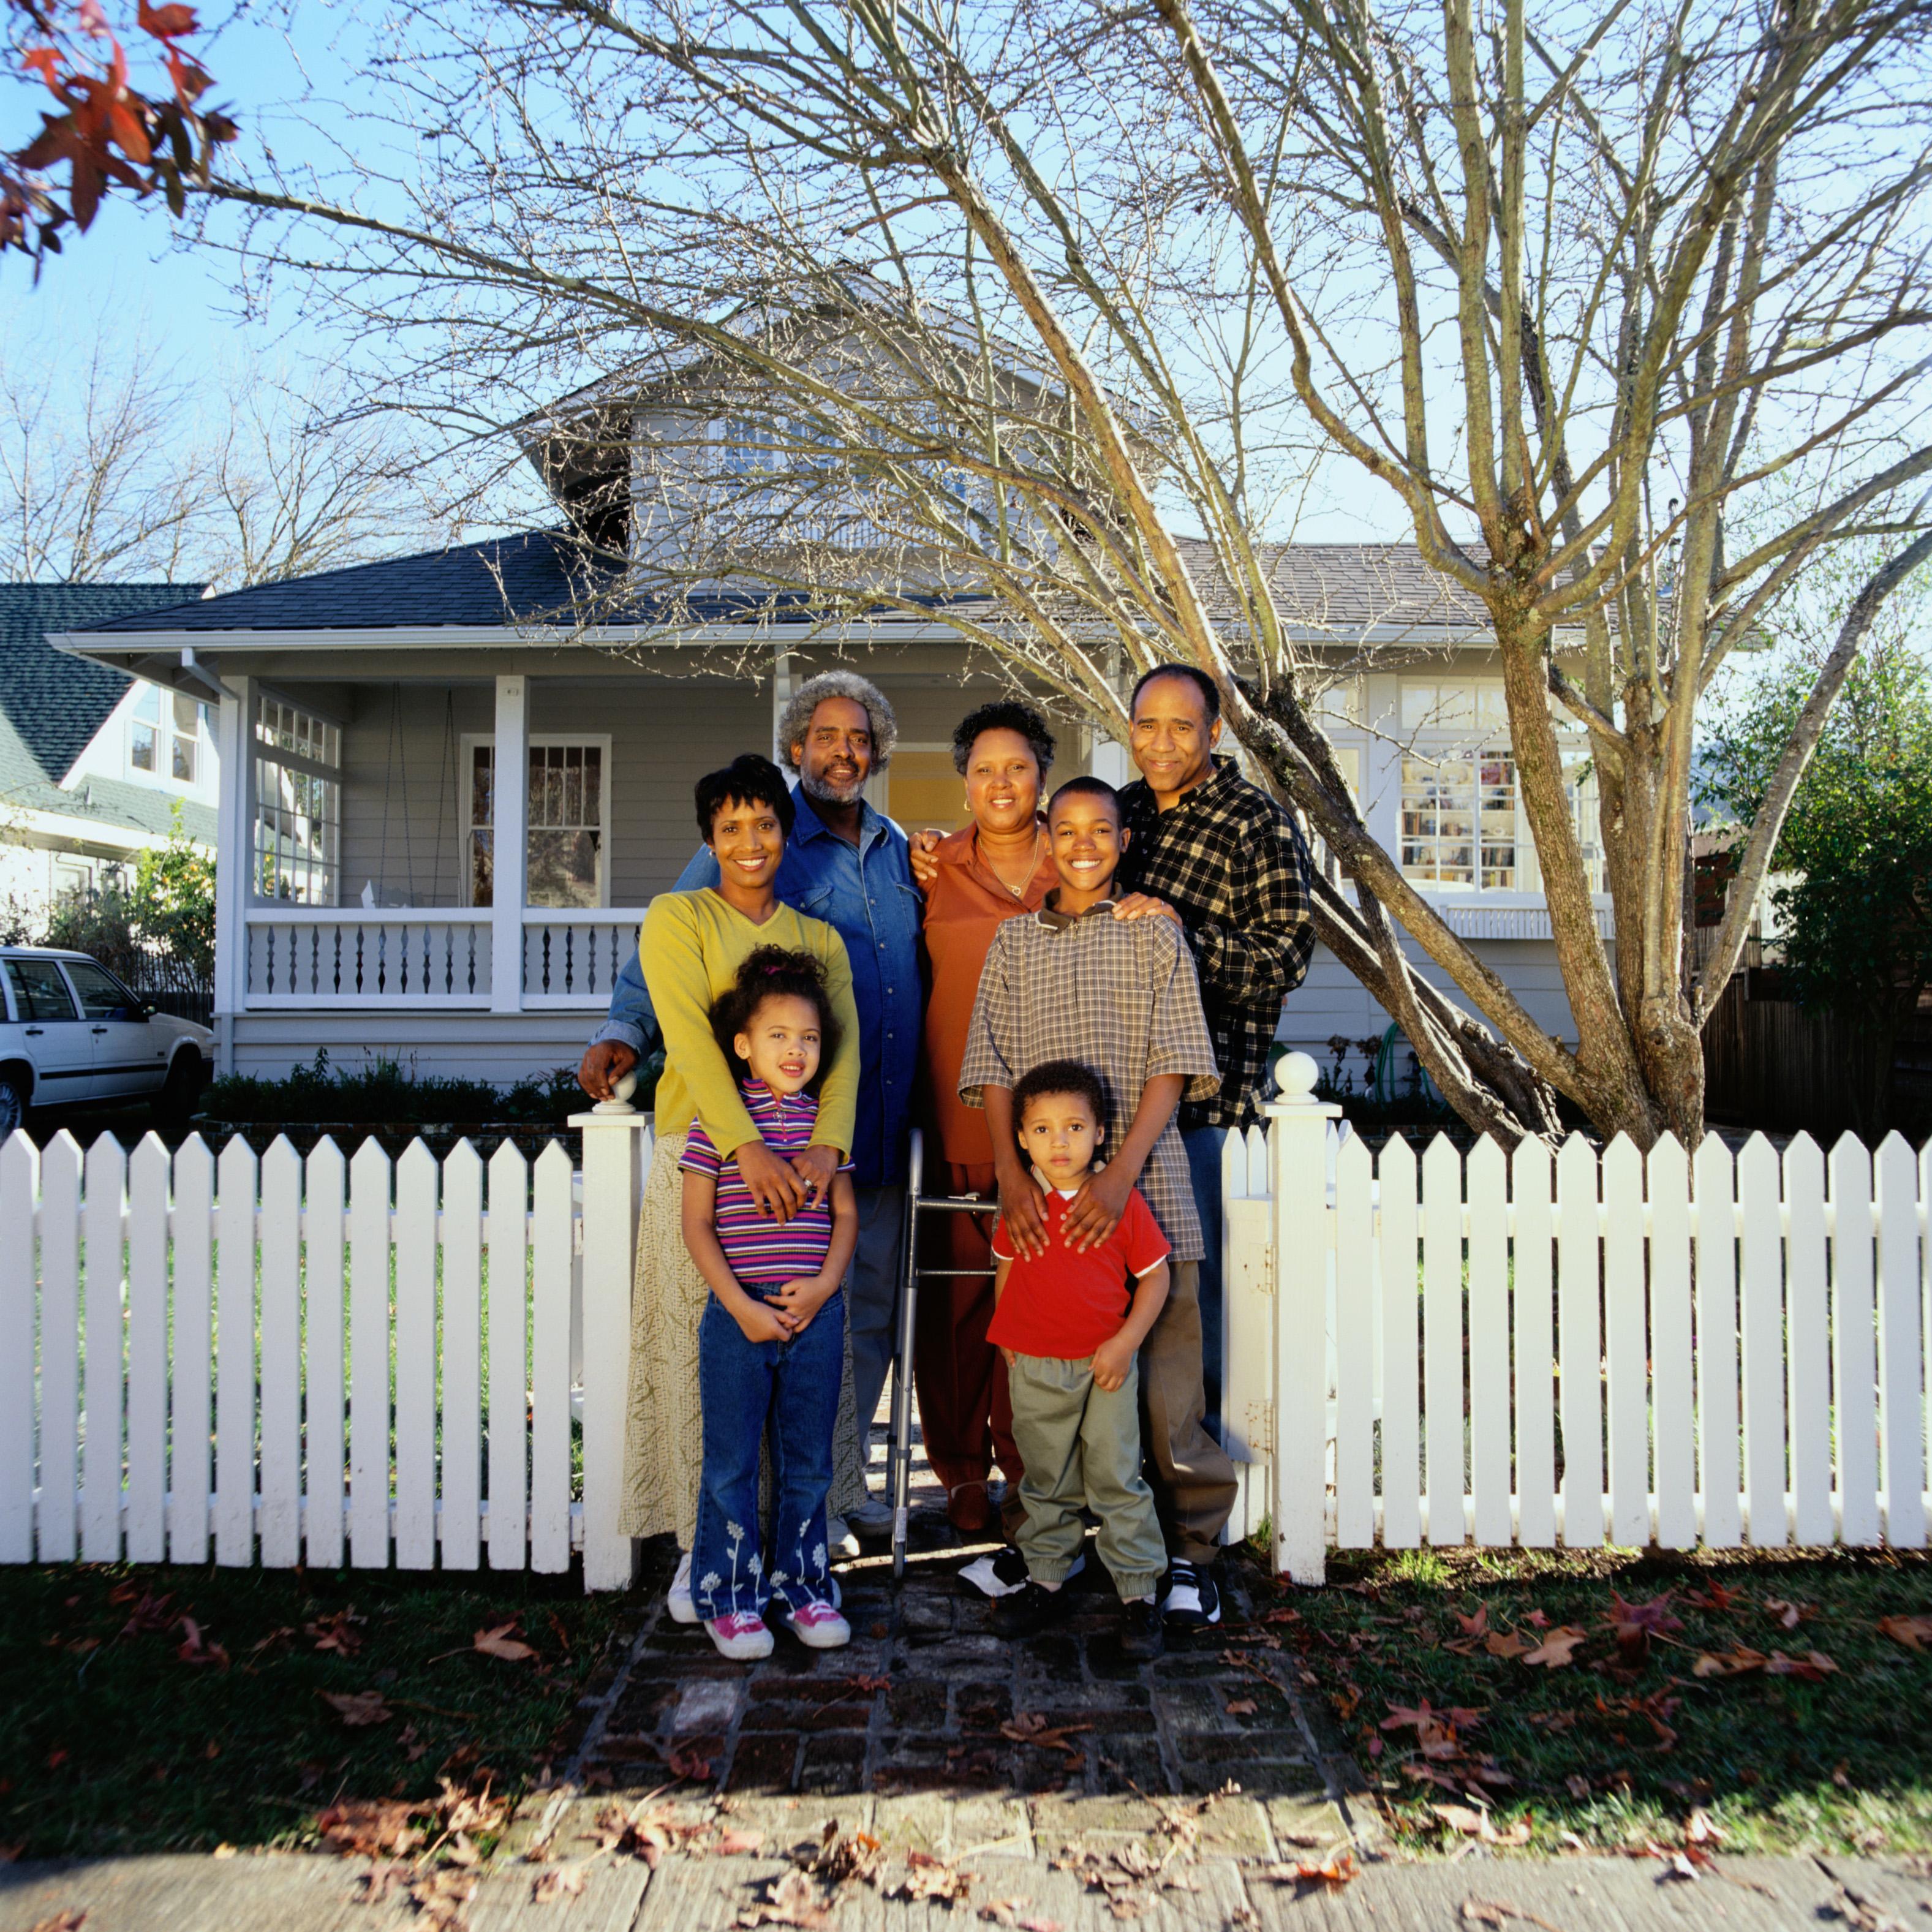 Multigenerational Housing Shorewest Latest News Our Blog